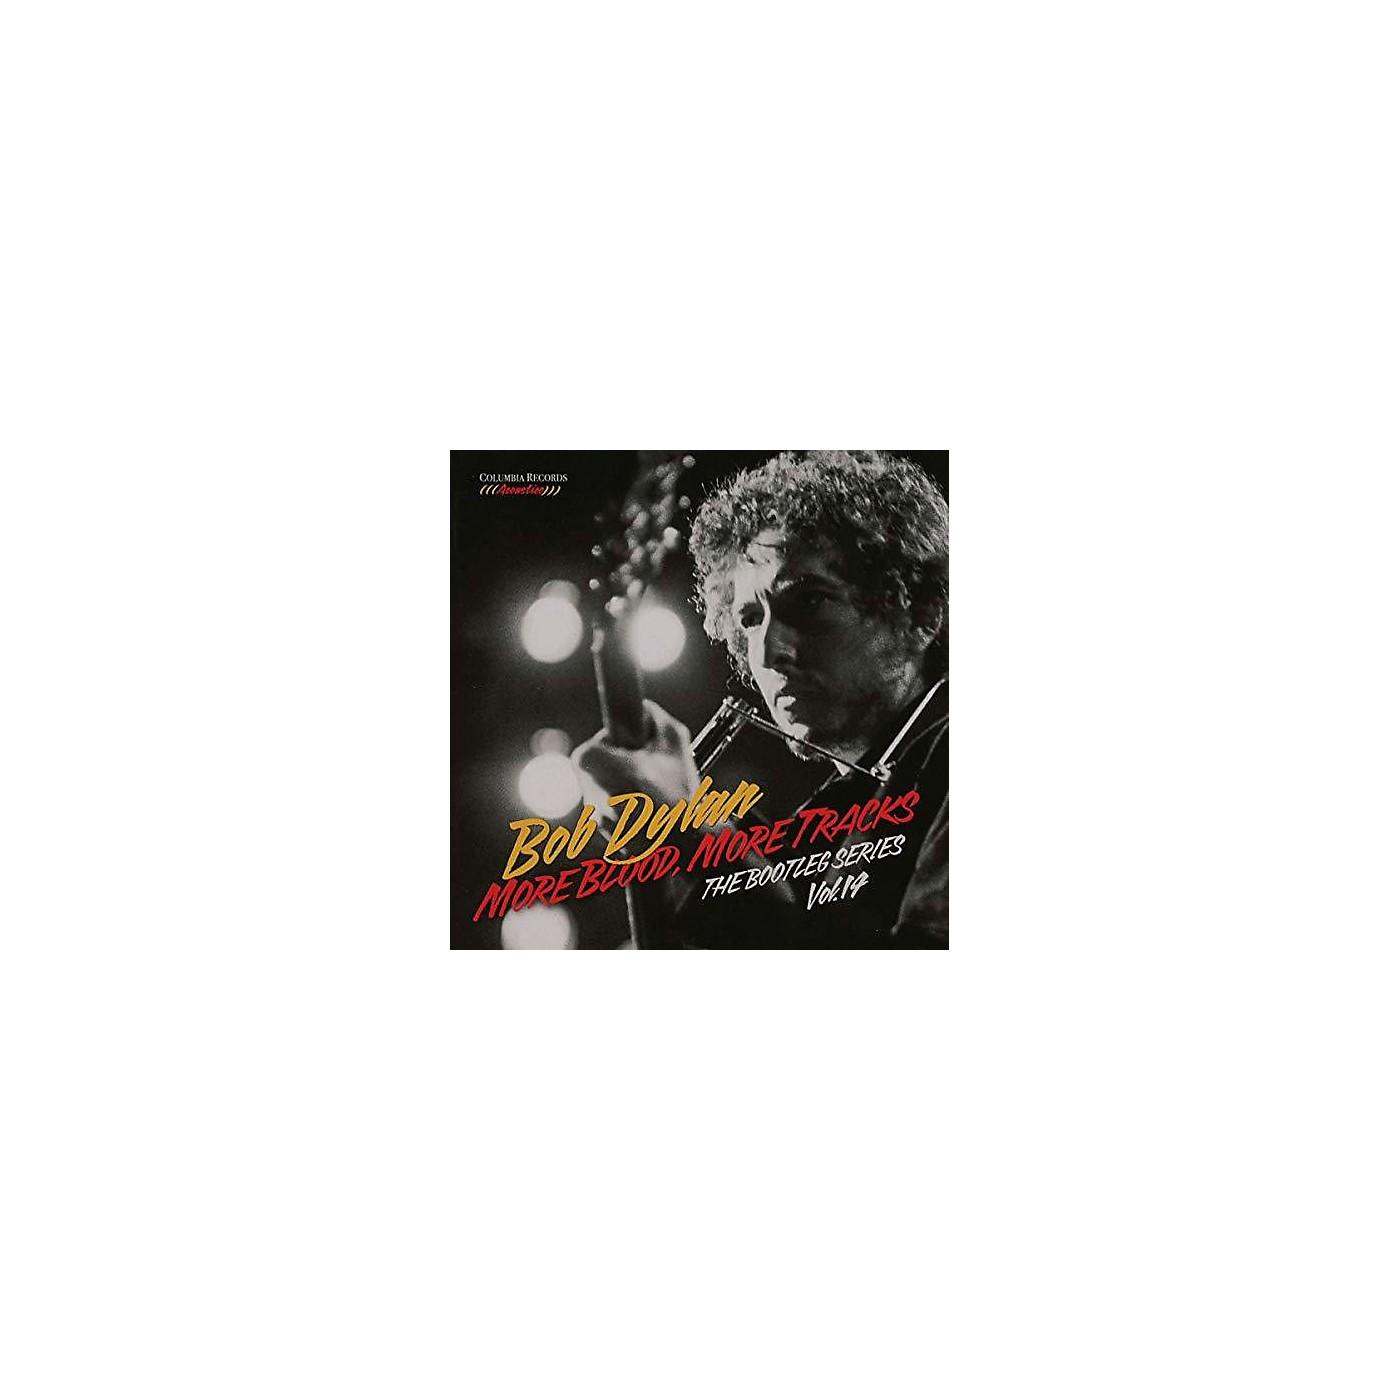 Alliance Bob Dylan - More Blood More Tracks: The Bootleg Series, Vol. 14 (CD) thumbnail